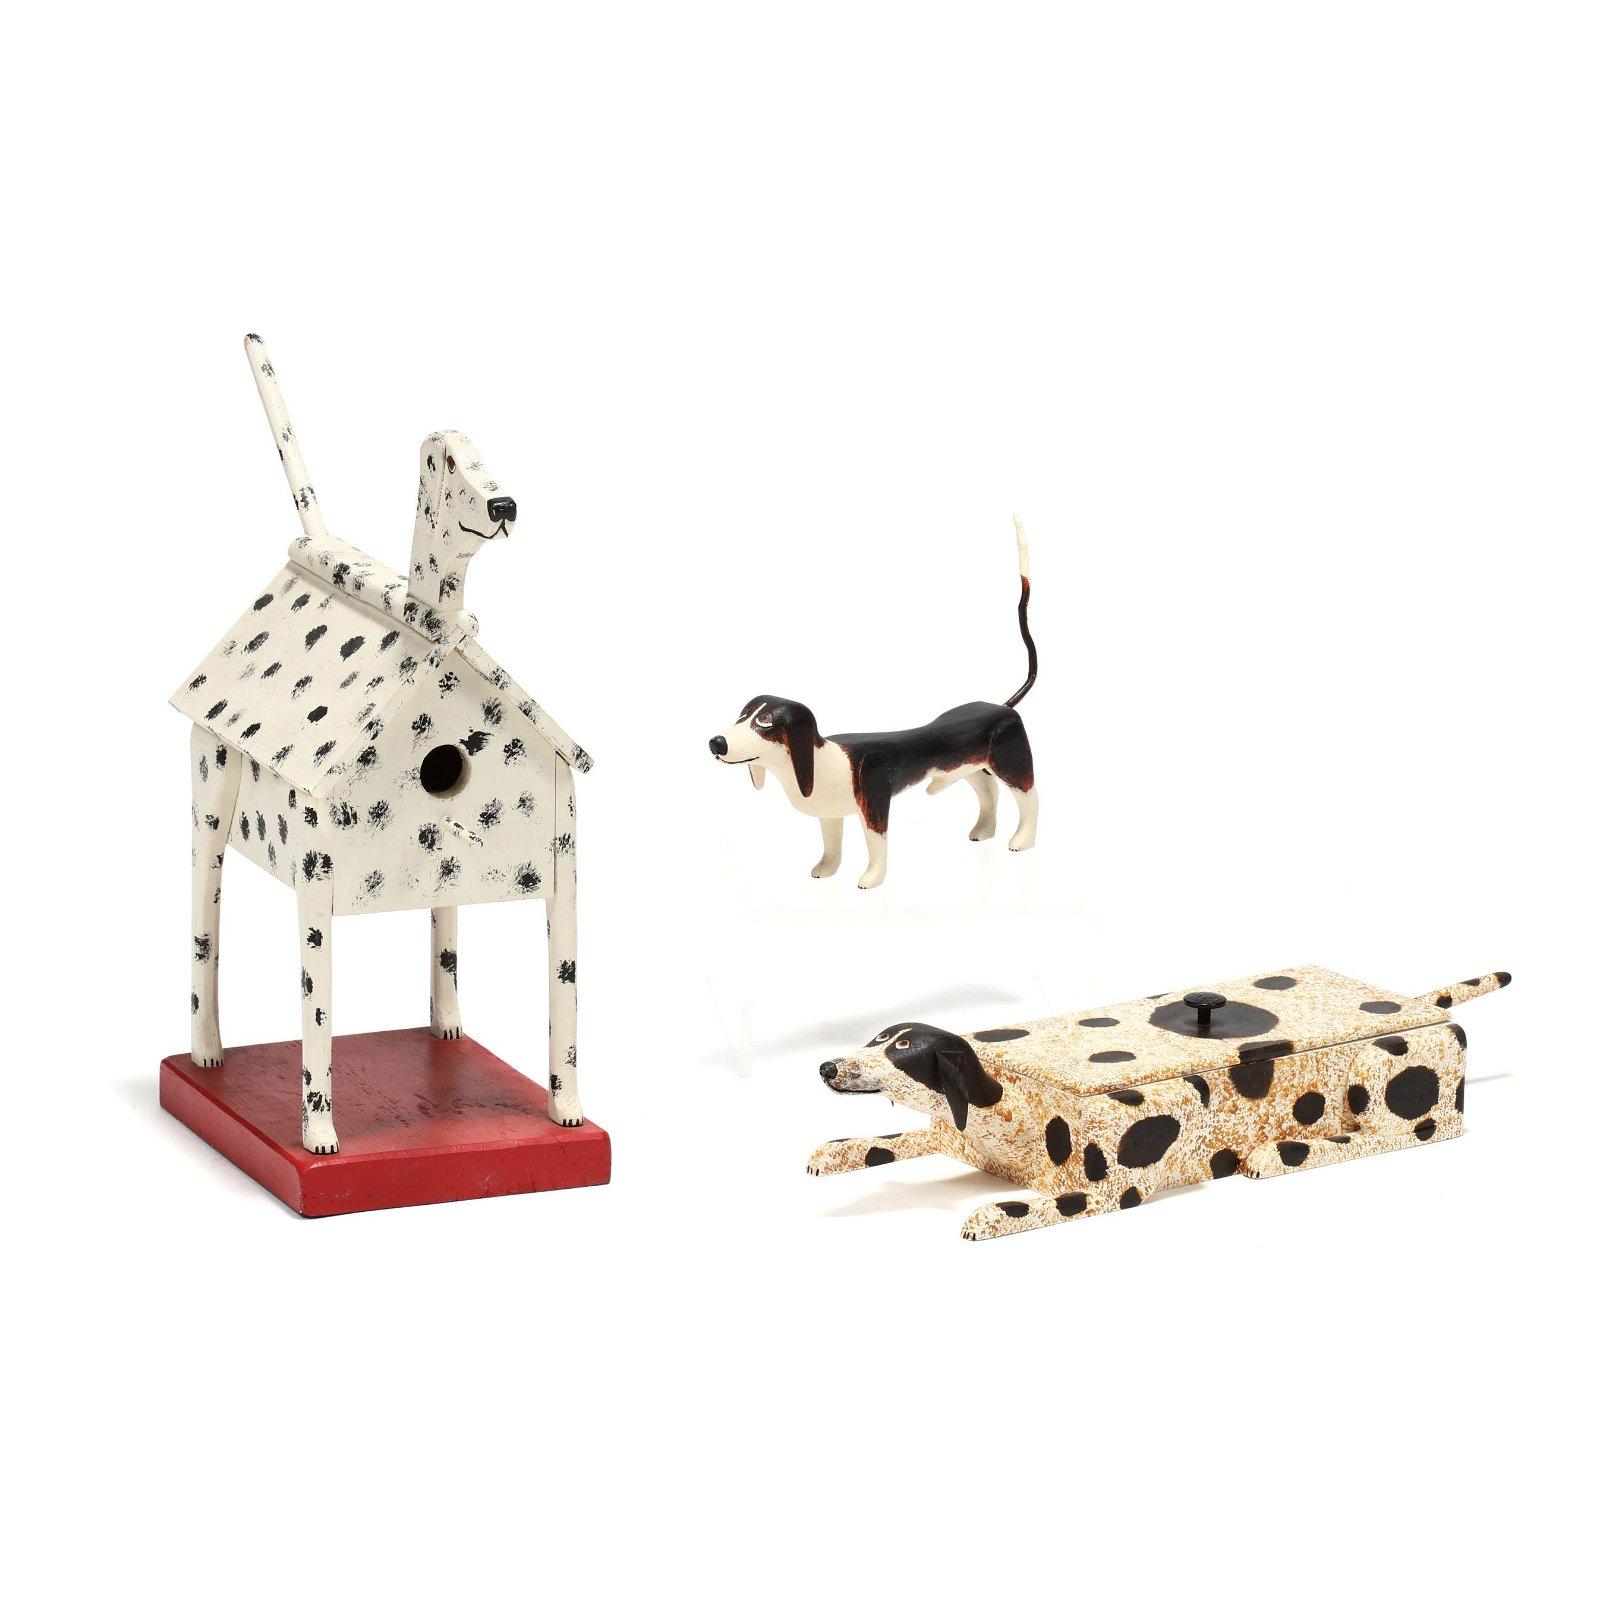 Three Carvings of Dogs, Georgia Folk Art, Roy Minshew,